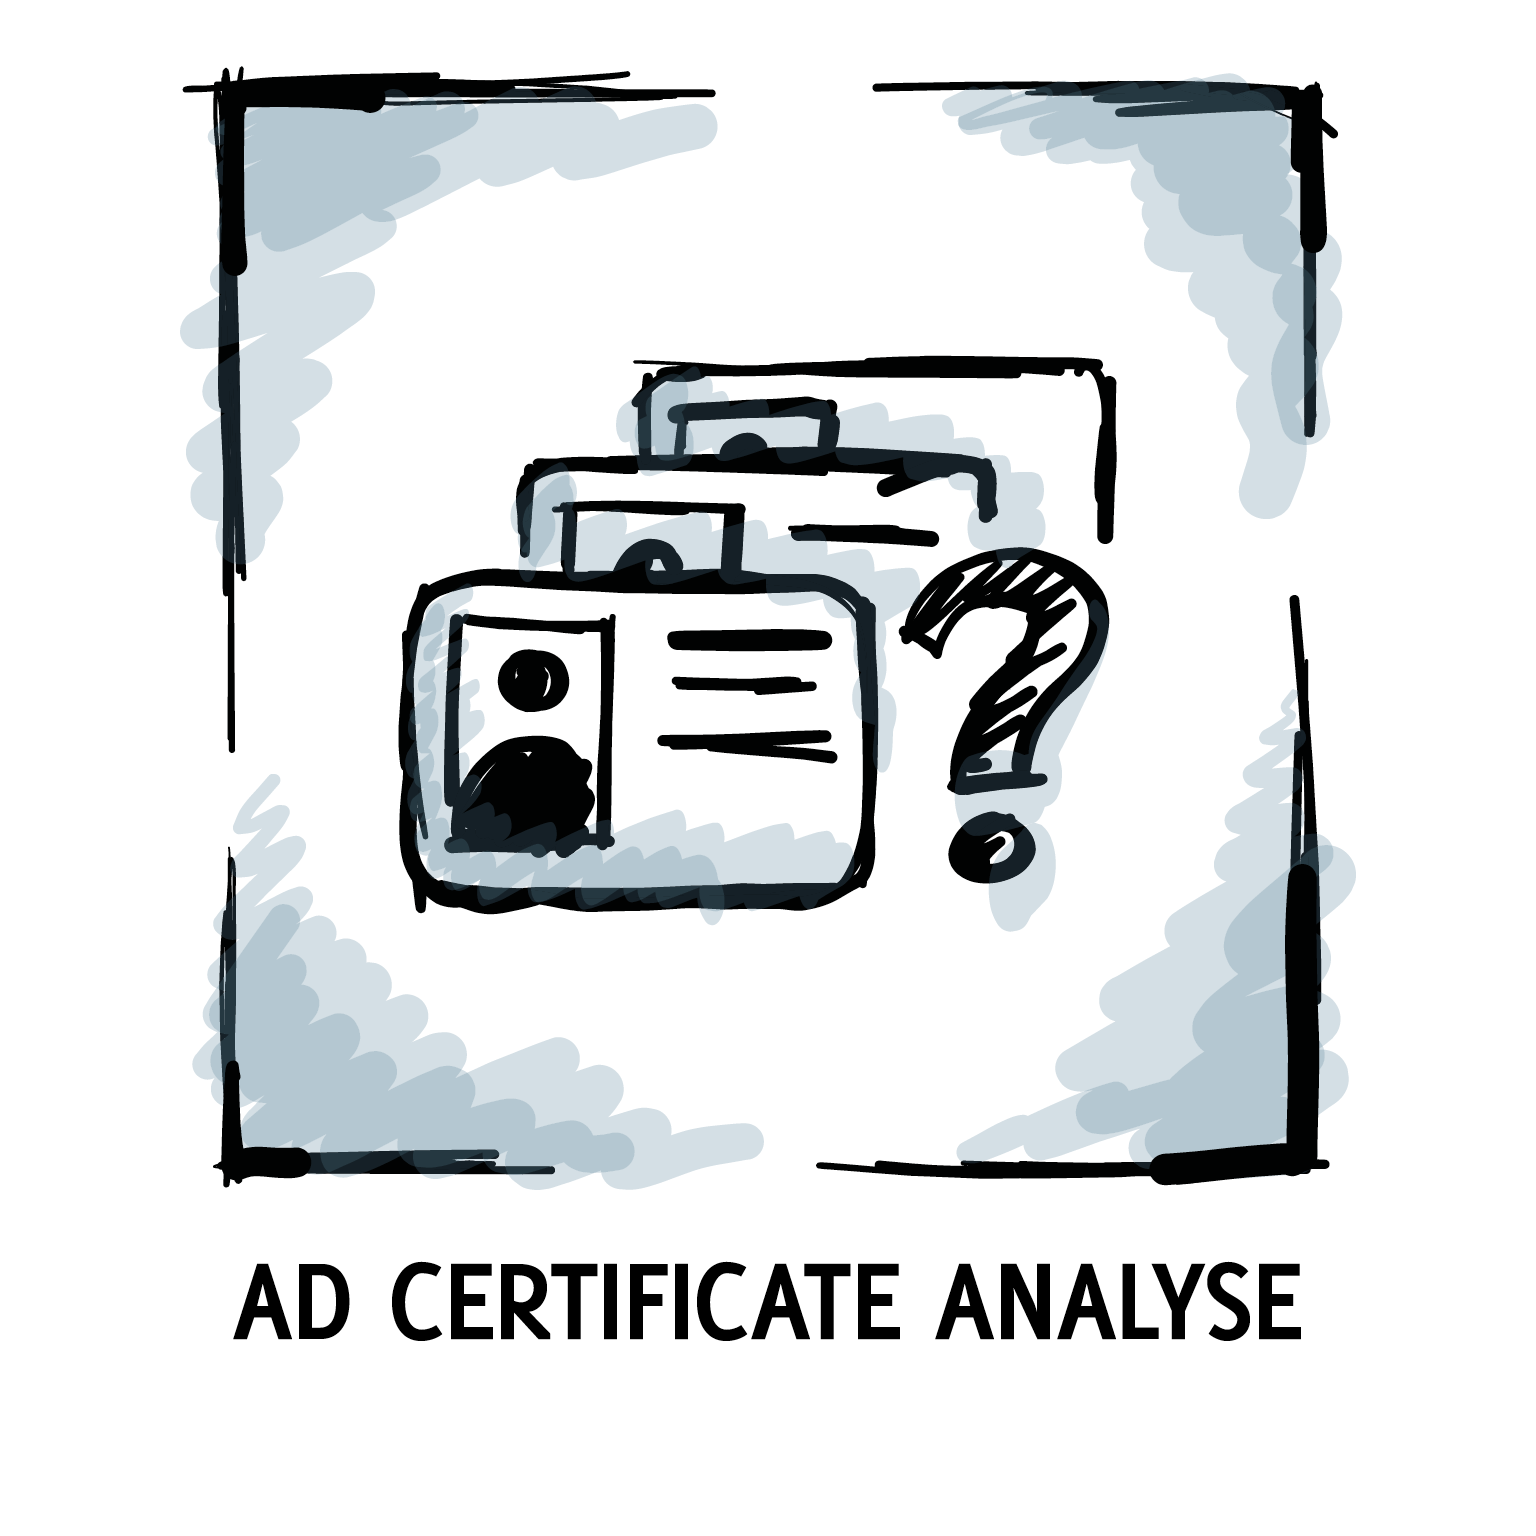 IMPROSEC Ikoner AD Certificate Analyse.png